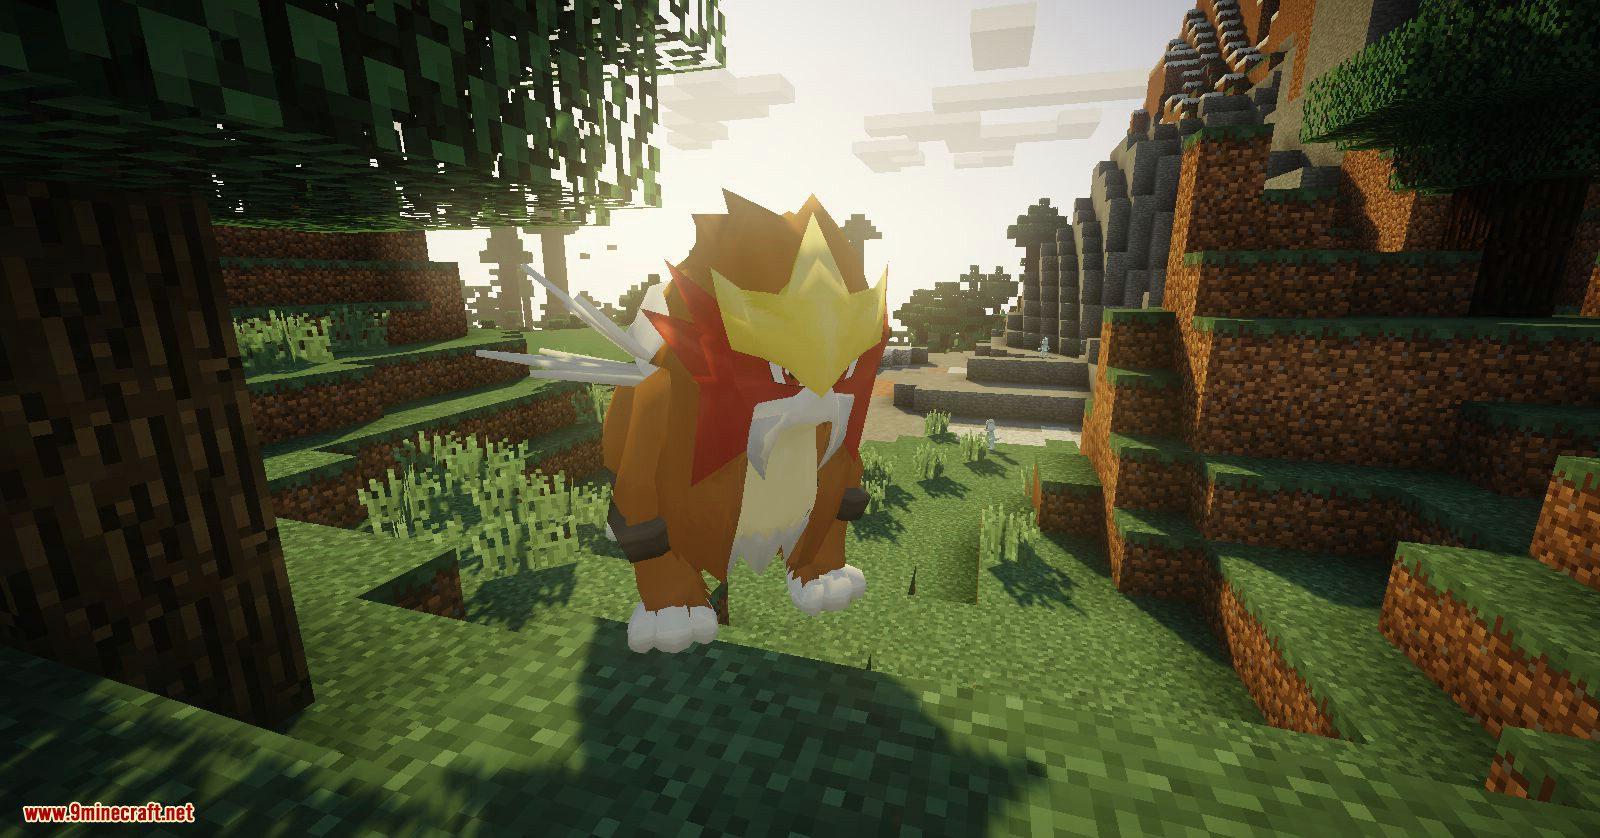 Gameshark mod for Minecraft (10)